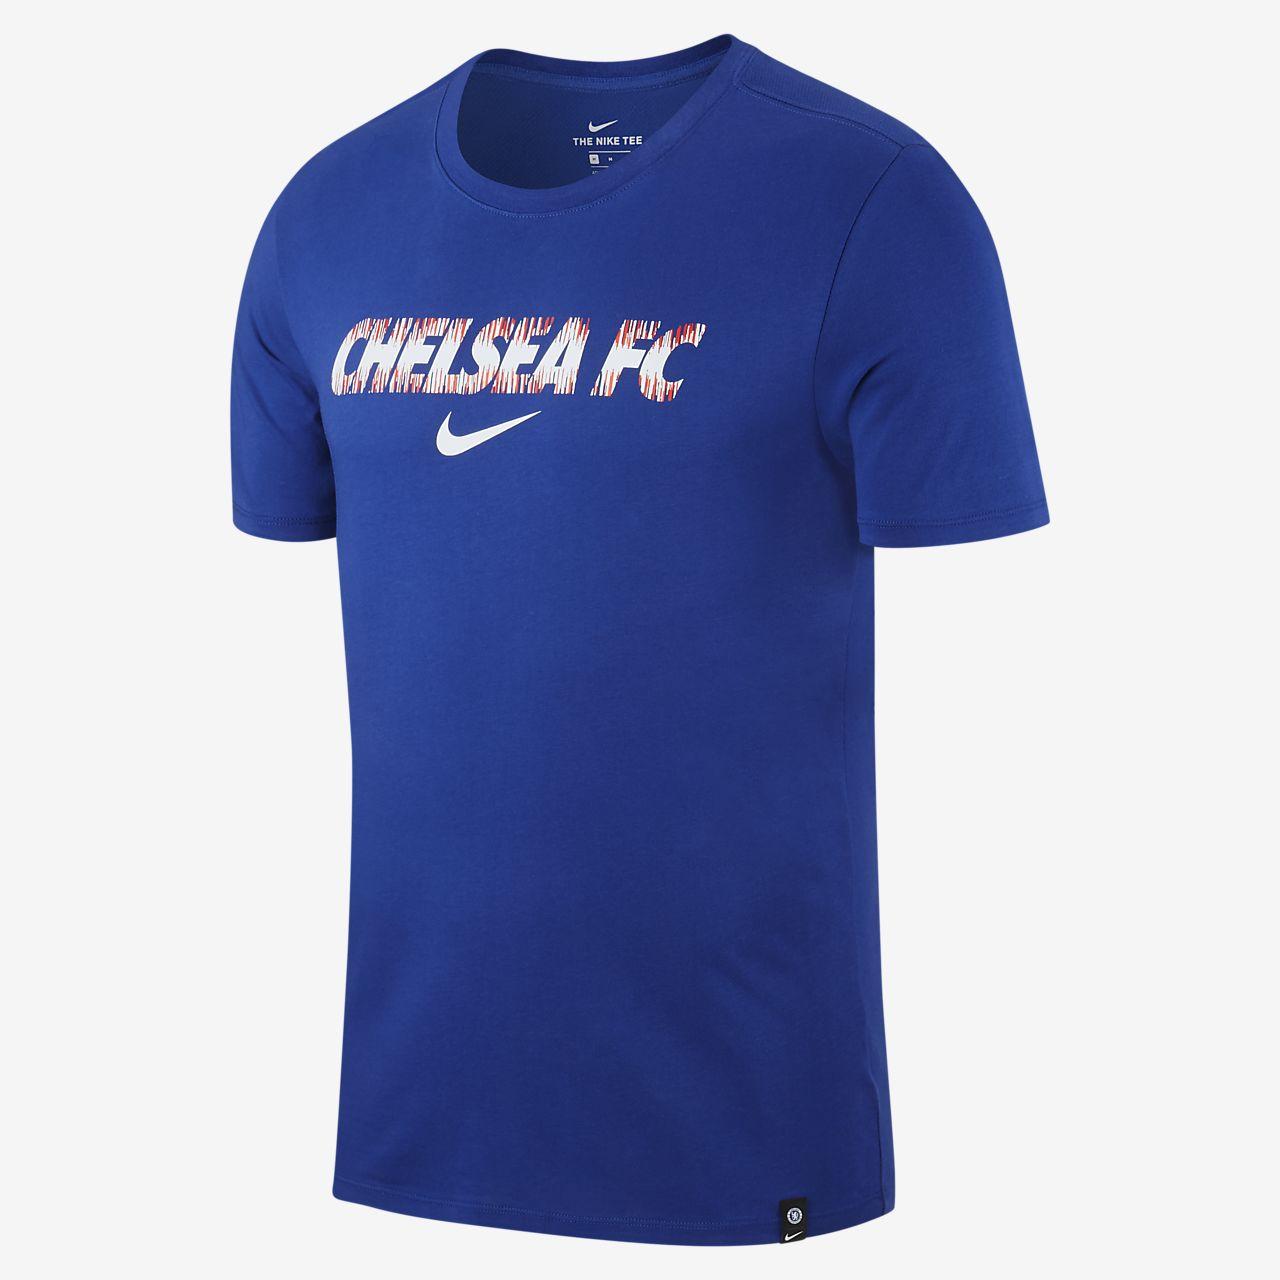 Chelsea FC Dri-FIT Men's Football T-Shirt